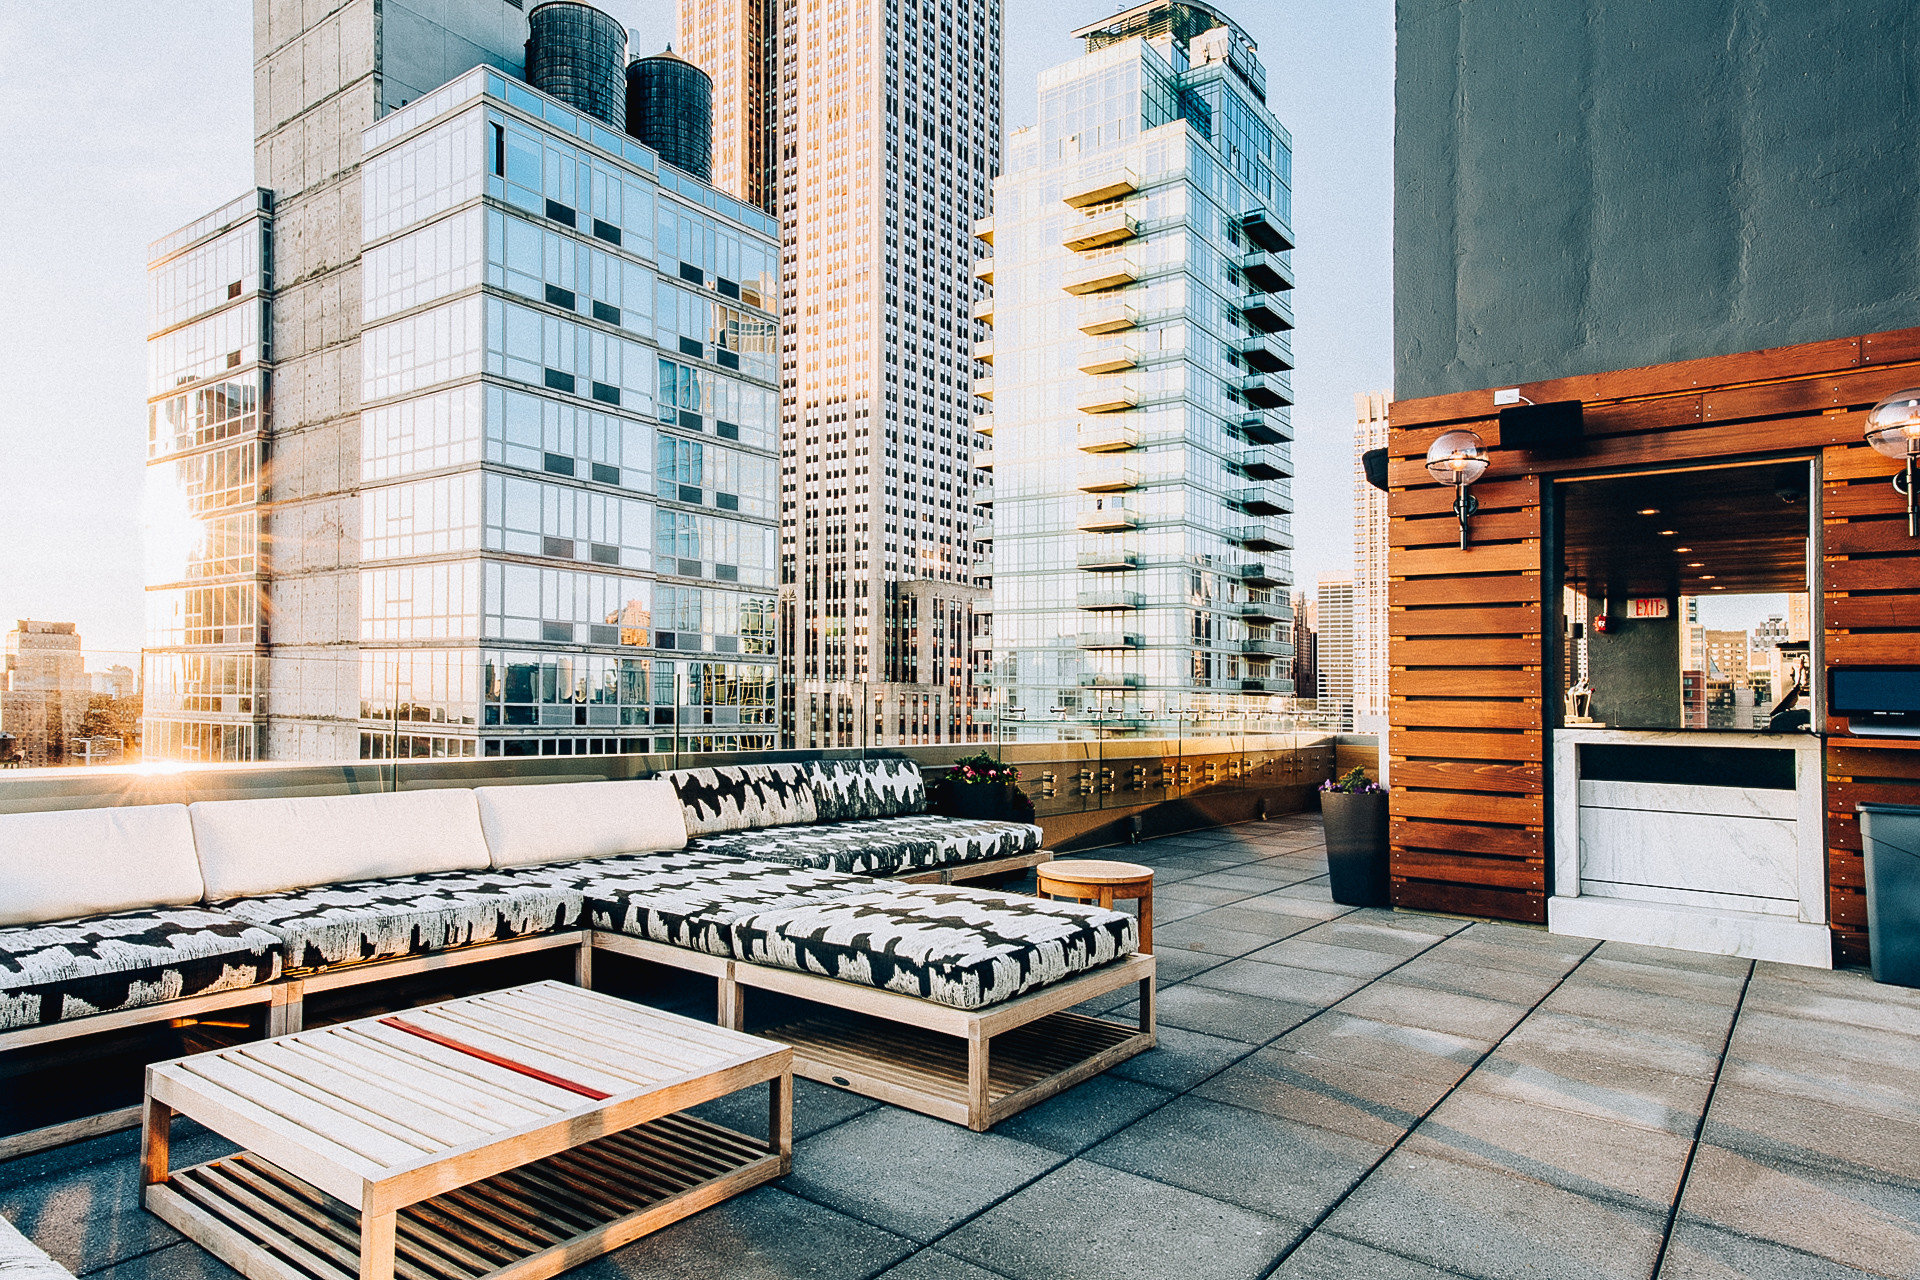 Food + Drink NYC condominium Architecture building furniture City apartment Downtown real estate skyscraper facade window